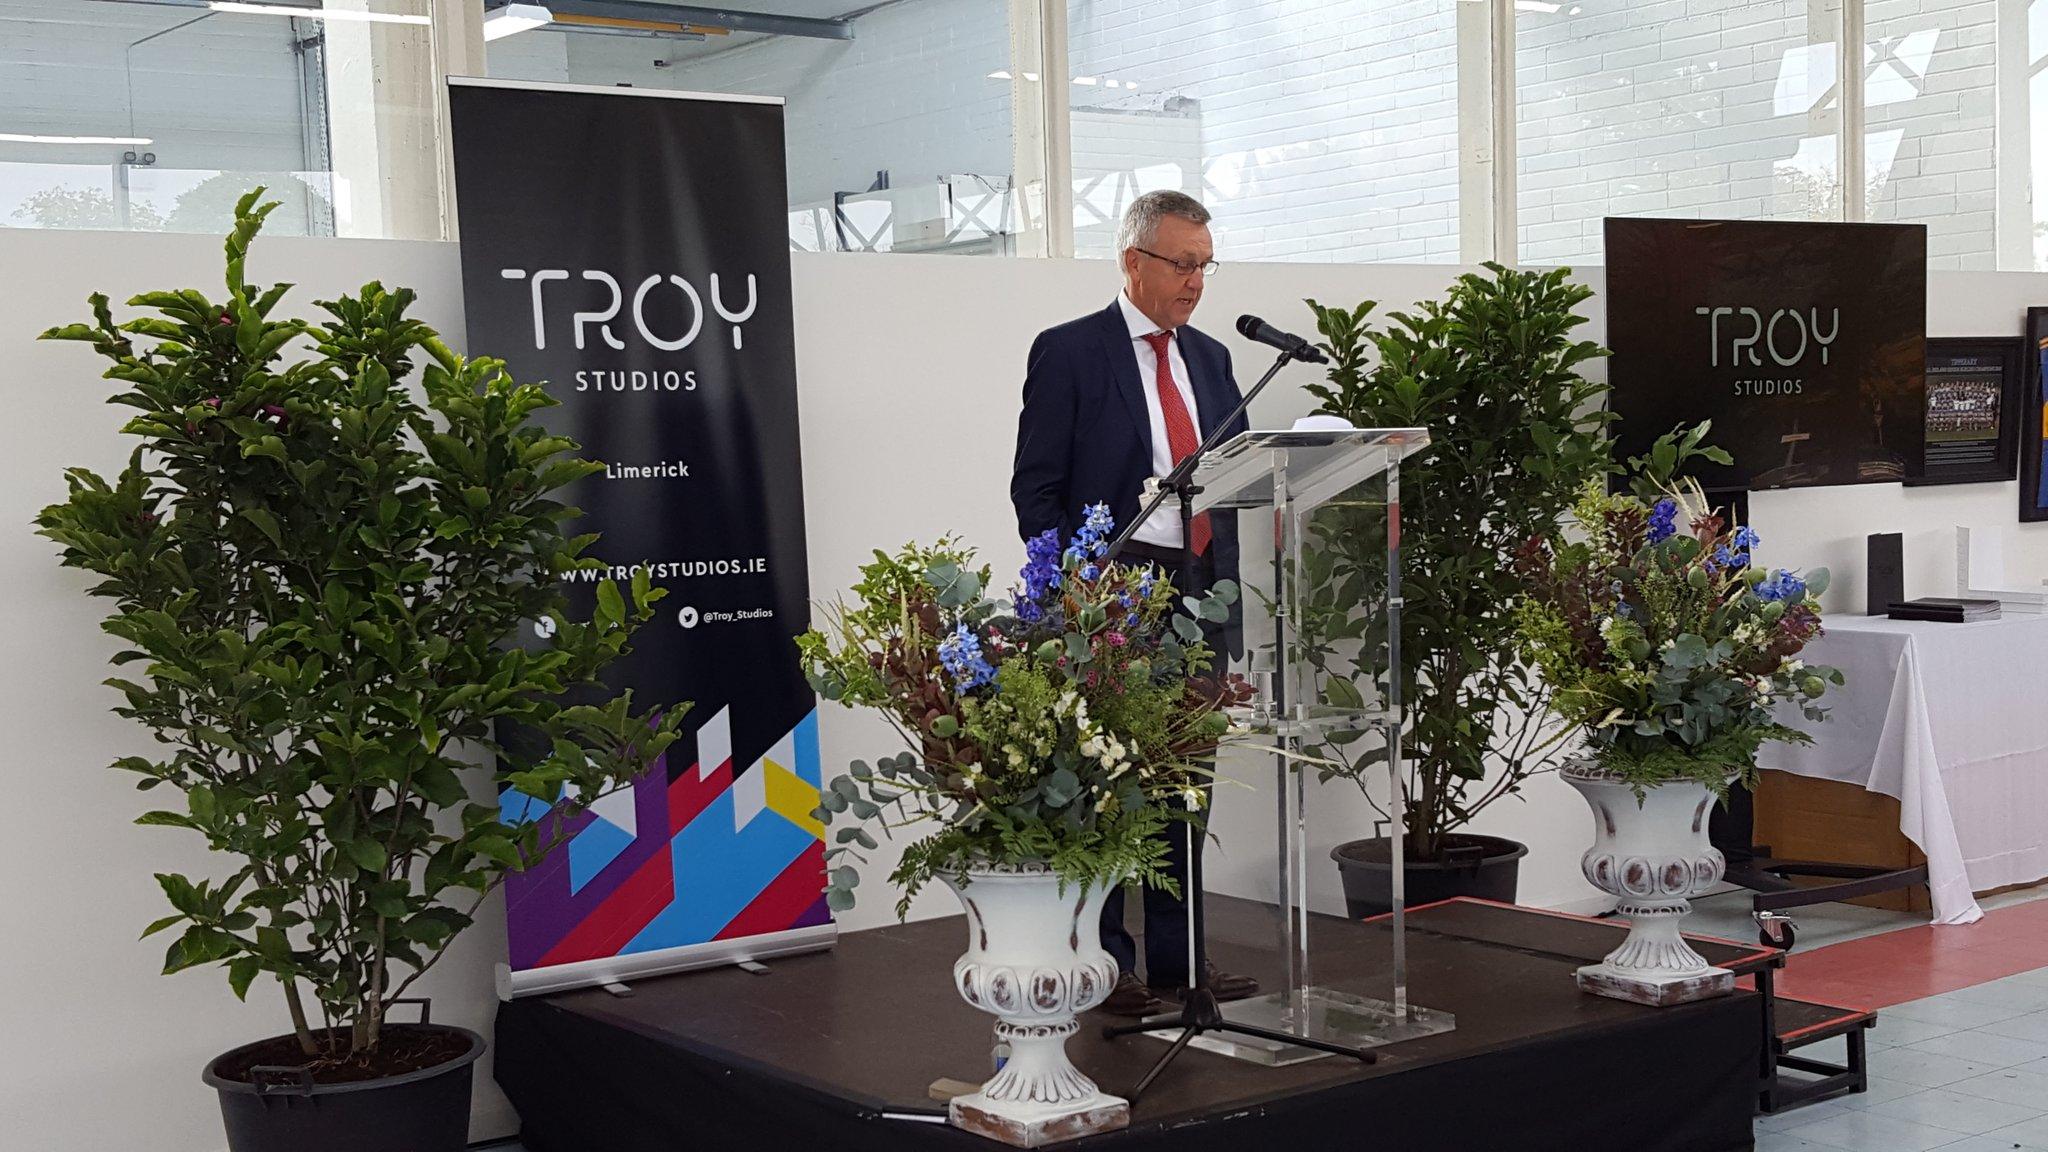 Chairman Joe Devin outlines plans for Troy Studios expansion